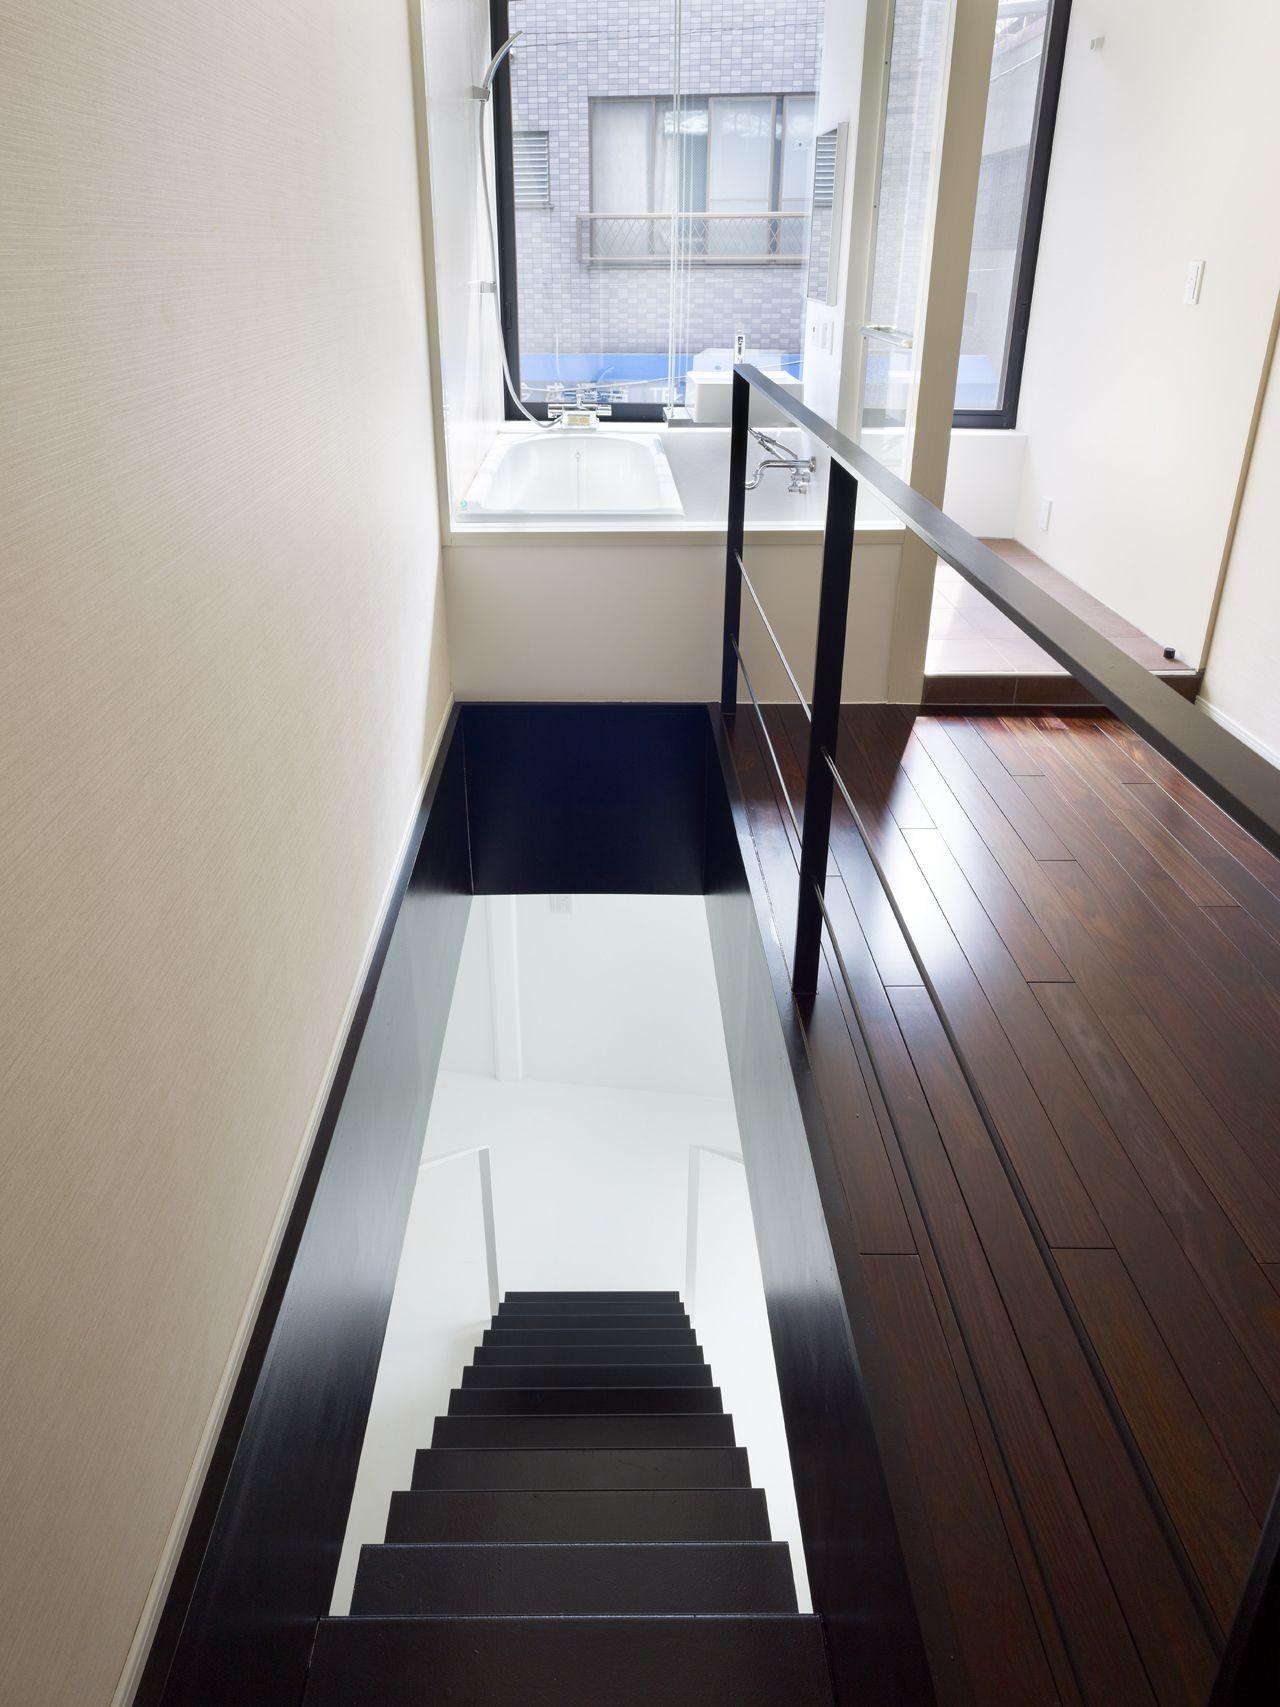 XYYX Apartment / Naf Architect & Design